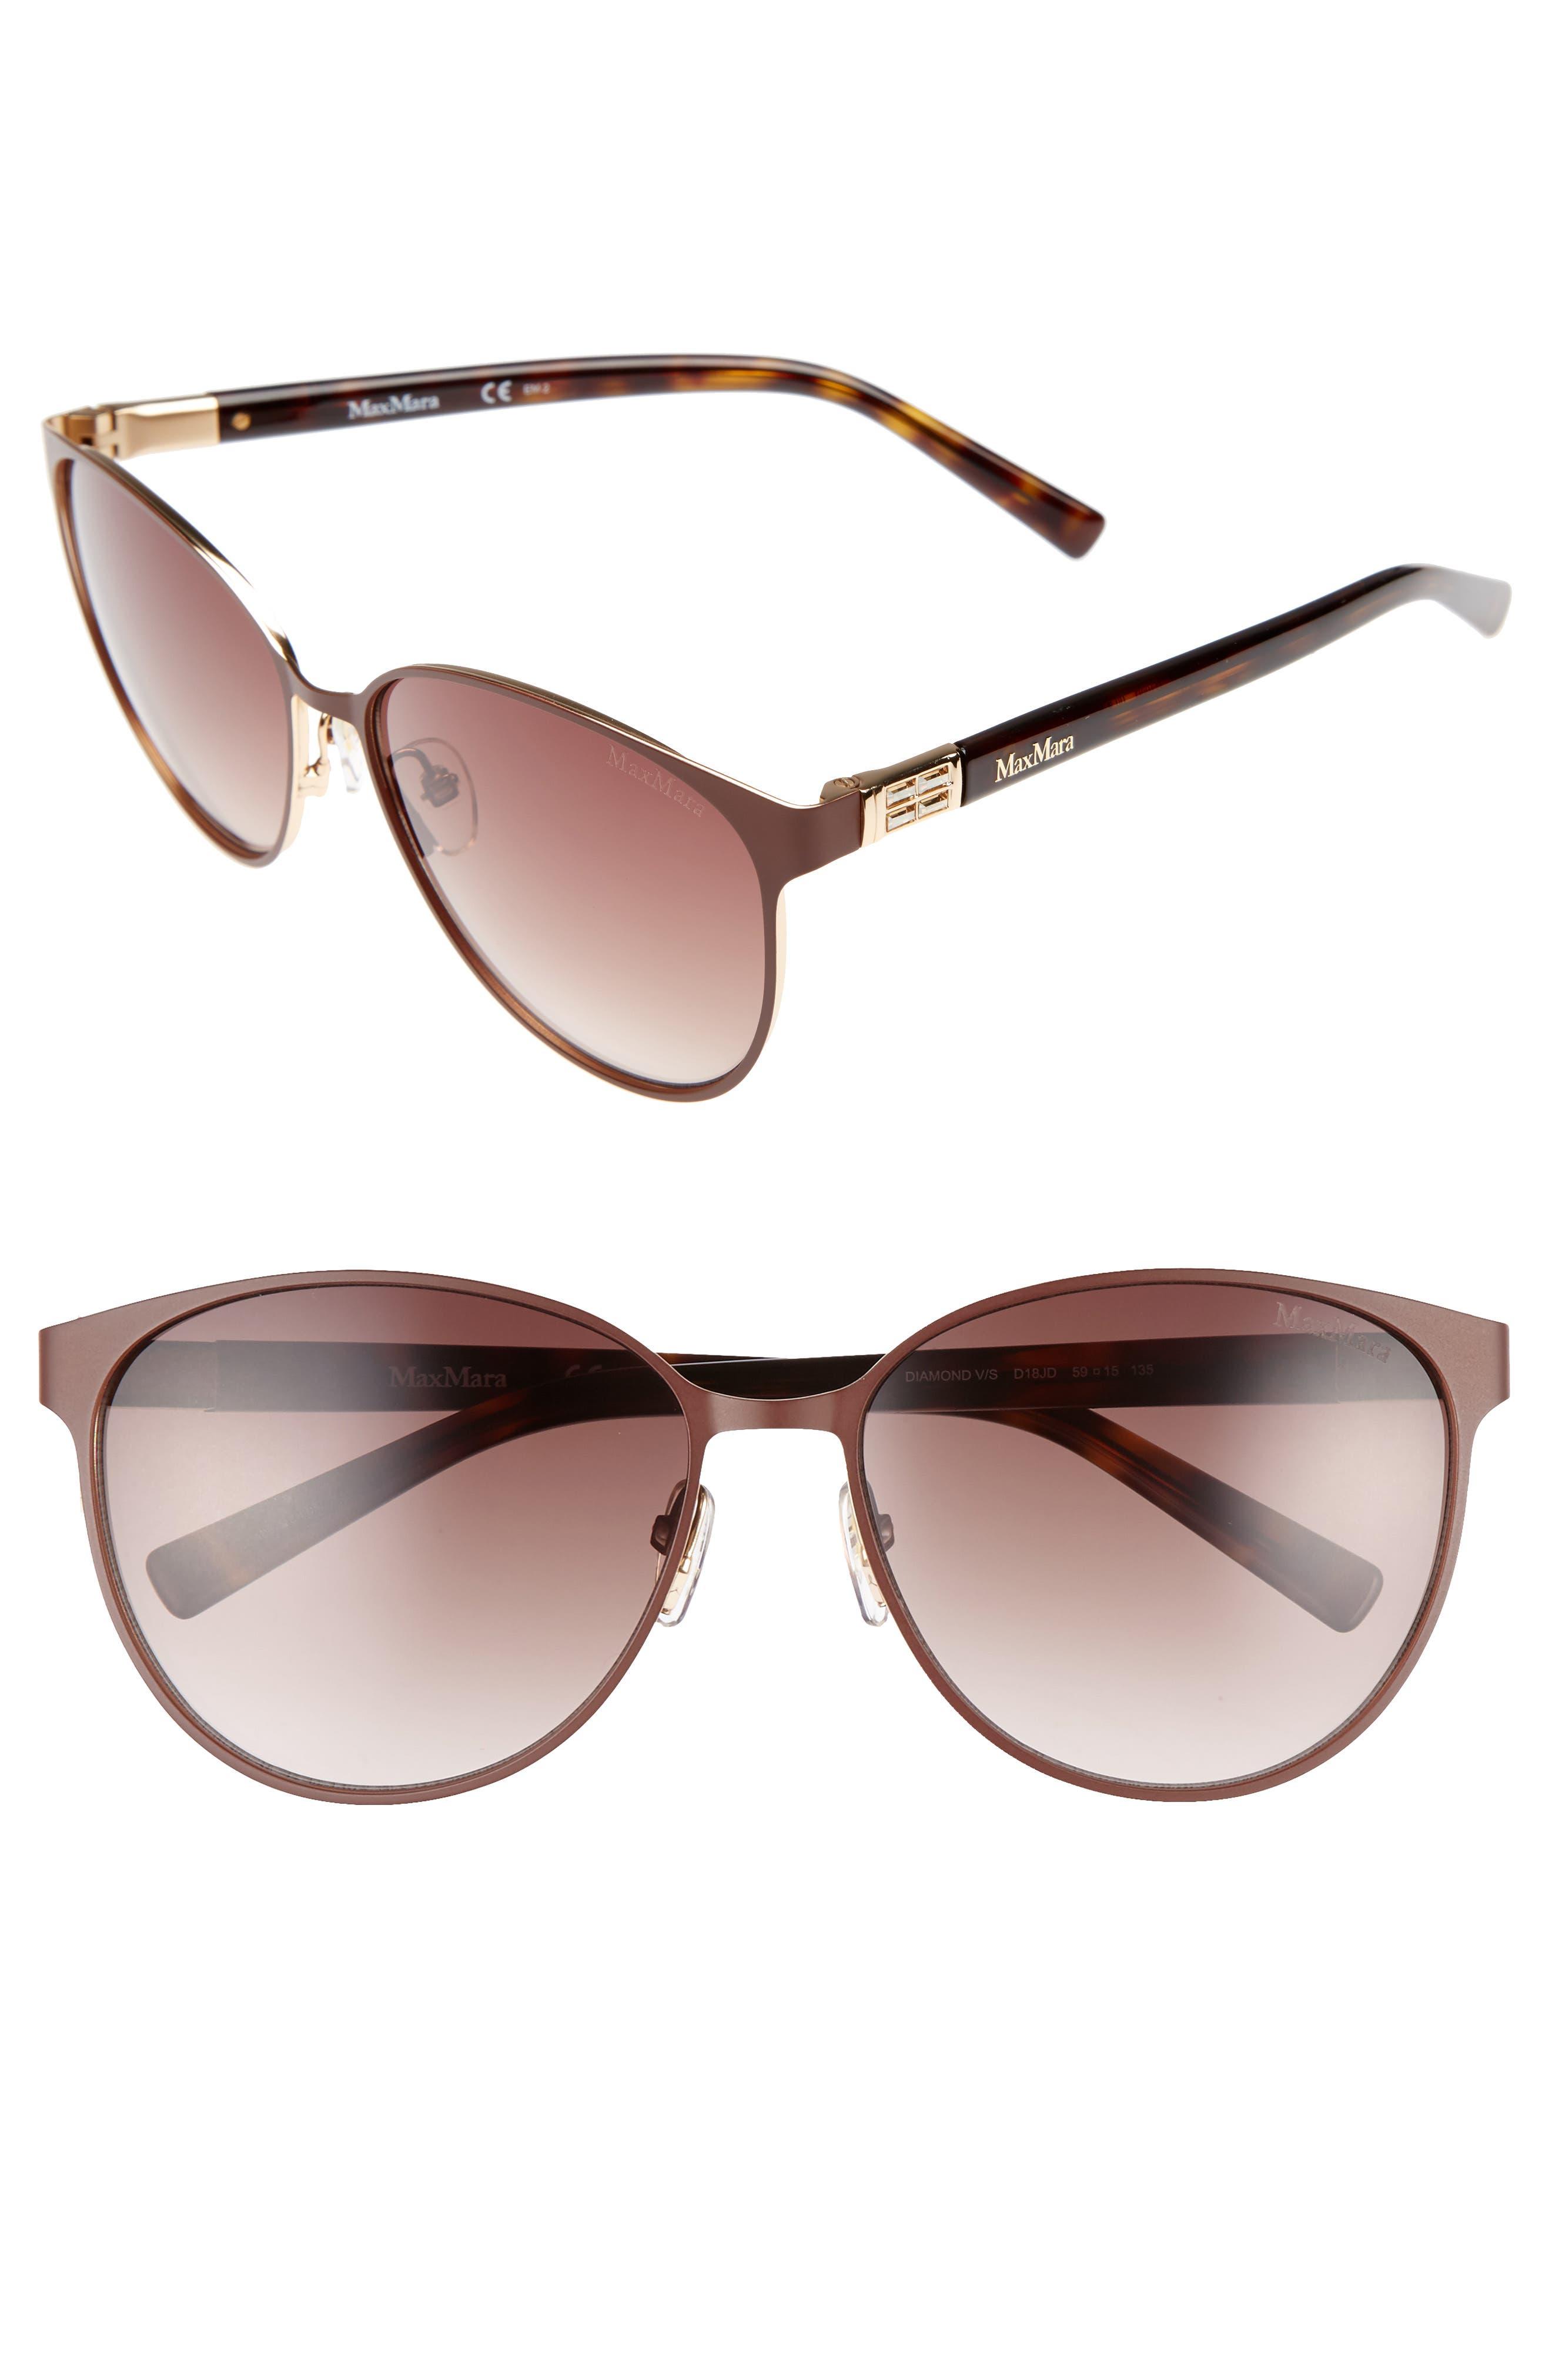 Diamov 59mm Gradient Cat Eye Sunglasses,                         Main,                         color, Matte Brown